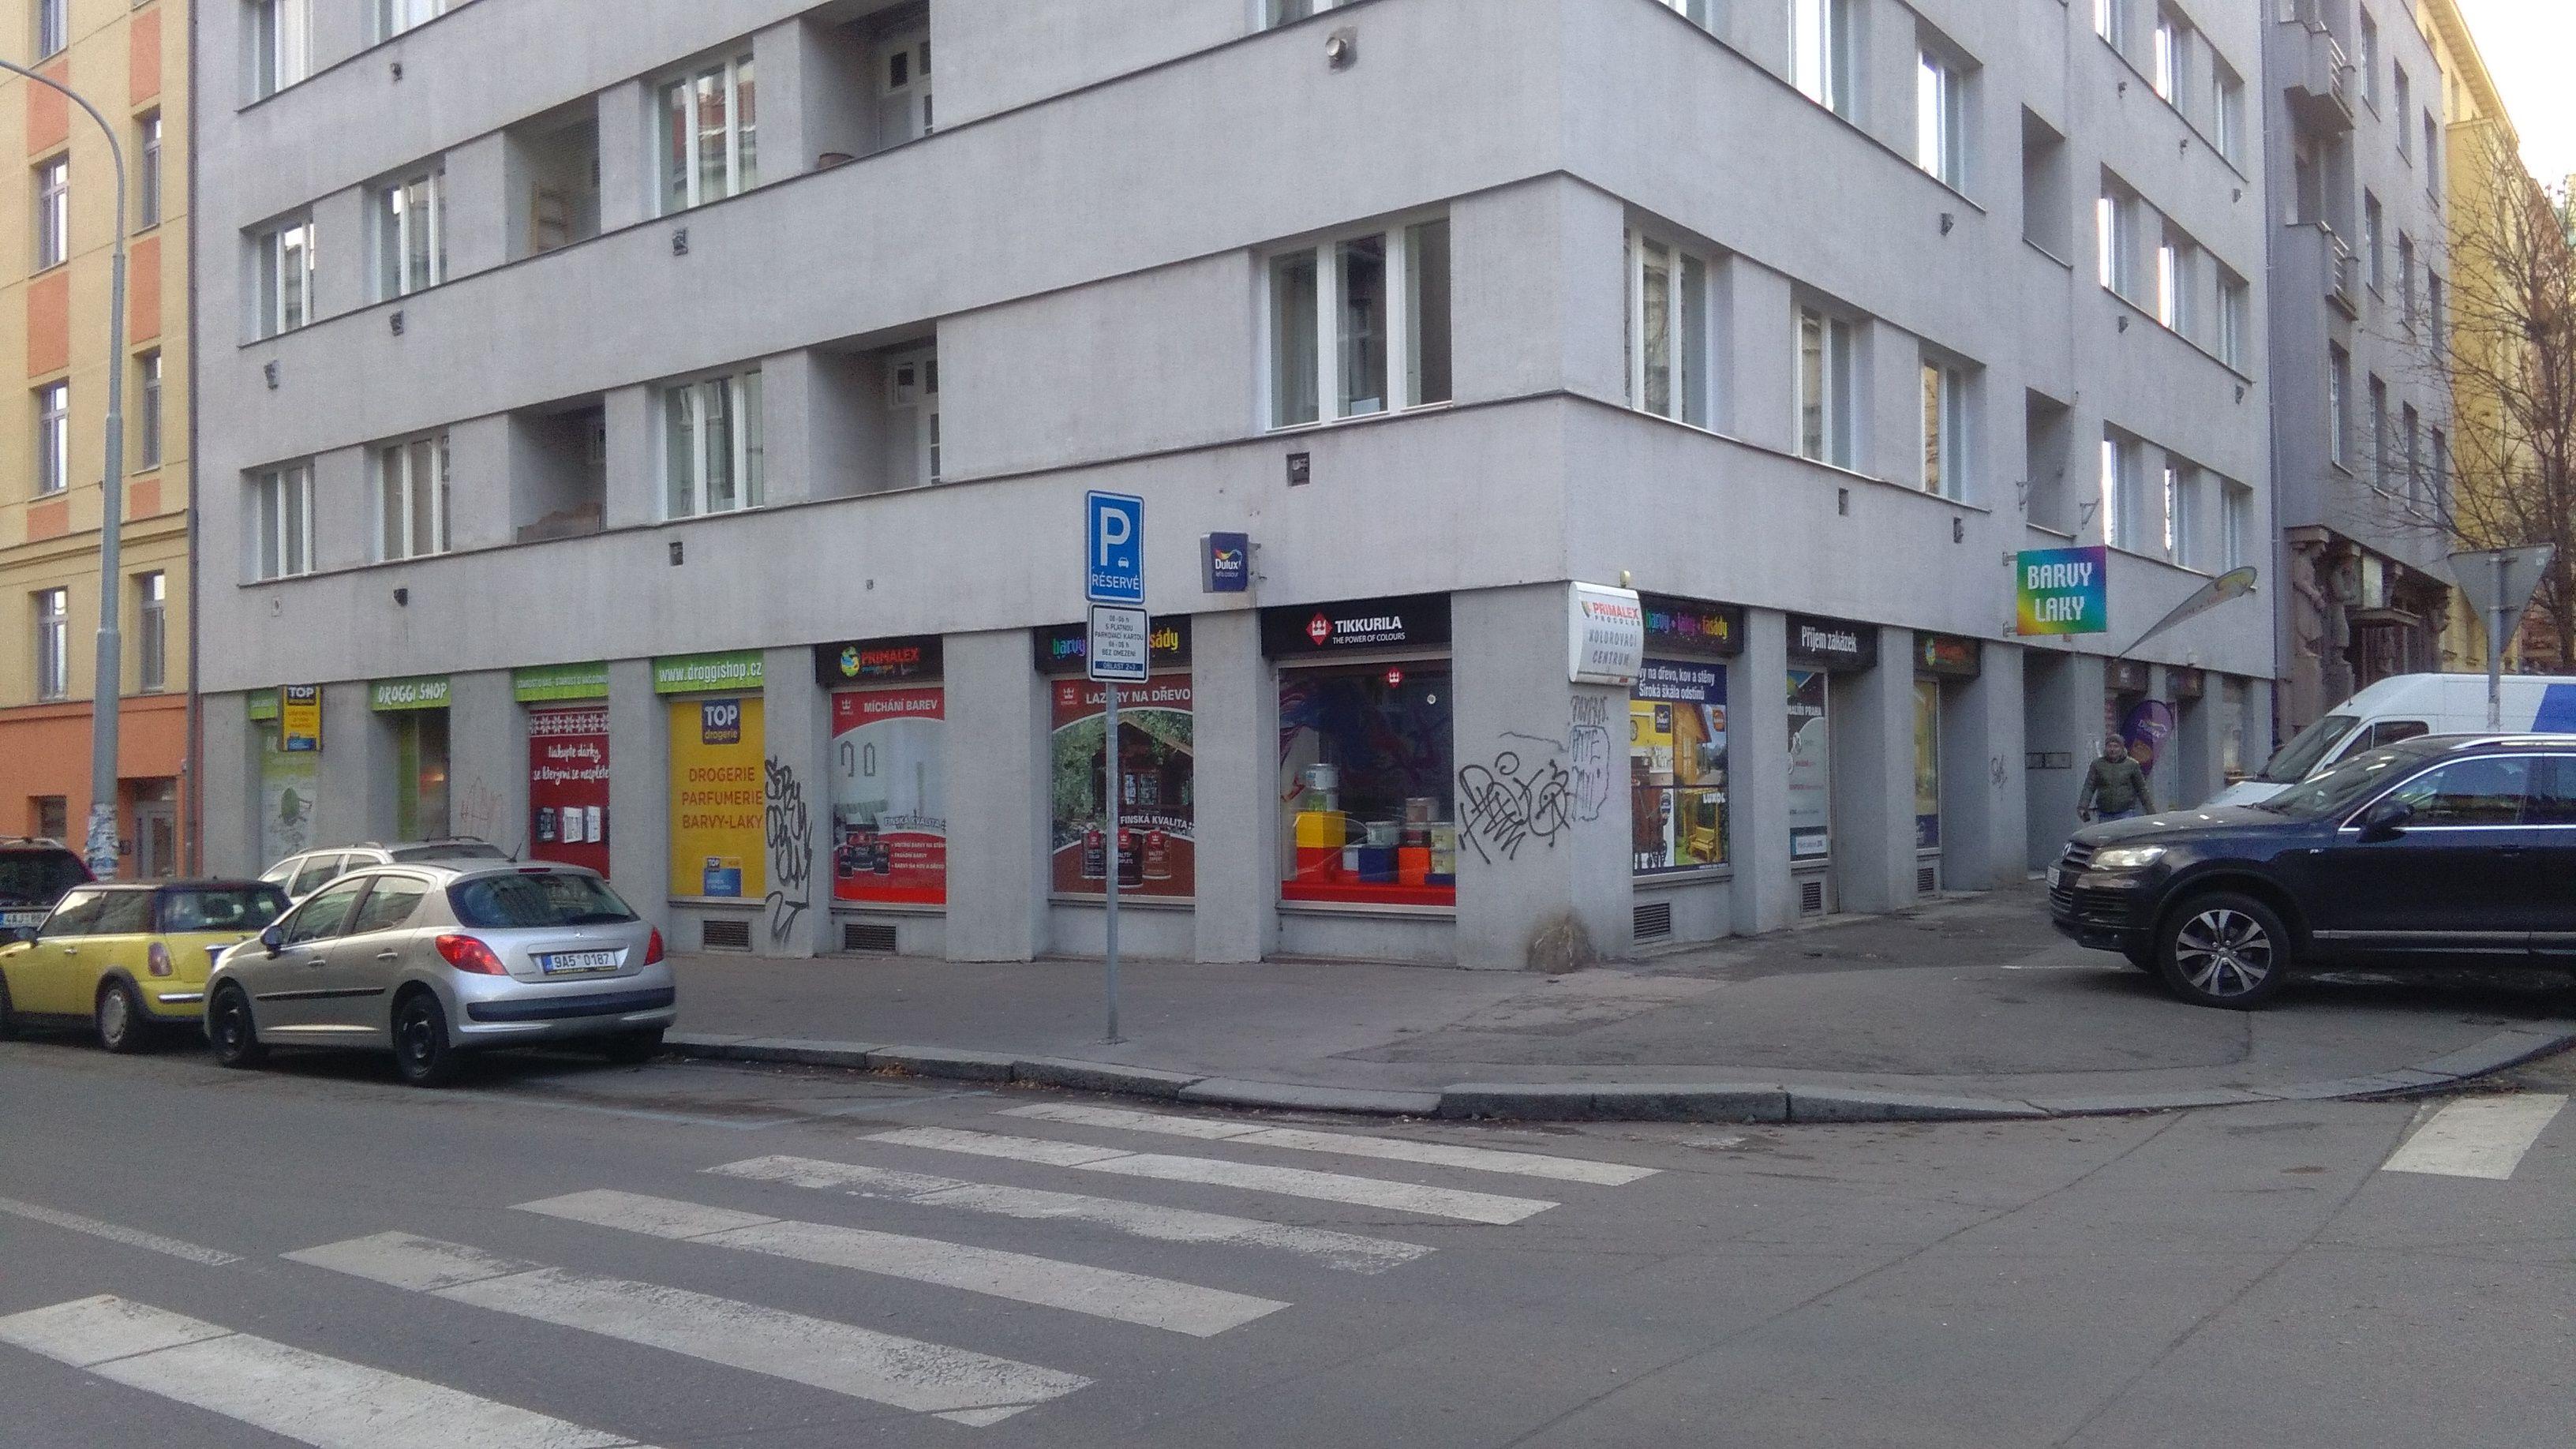 Praha 3 -  Ondříčkova 12 (DROGGI SHOP)